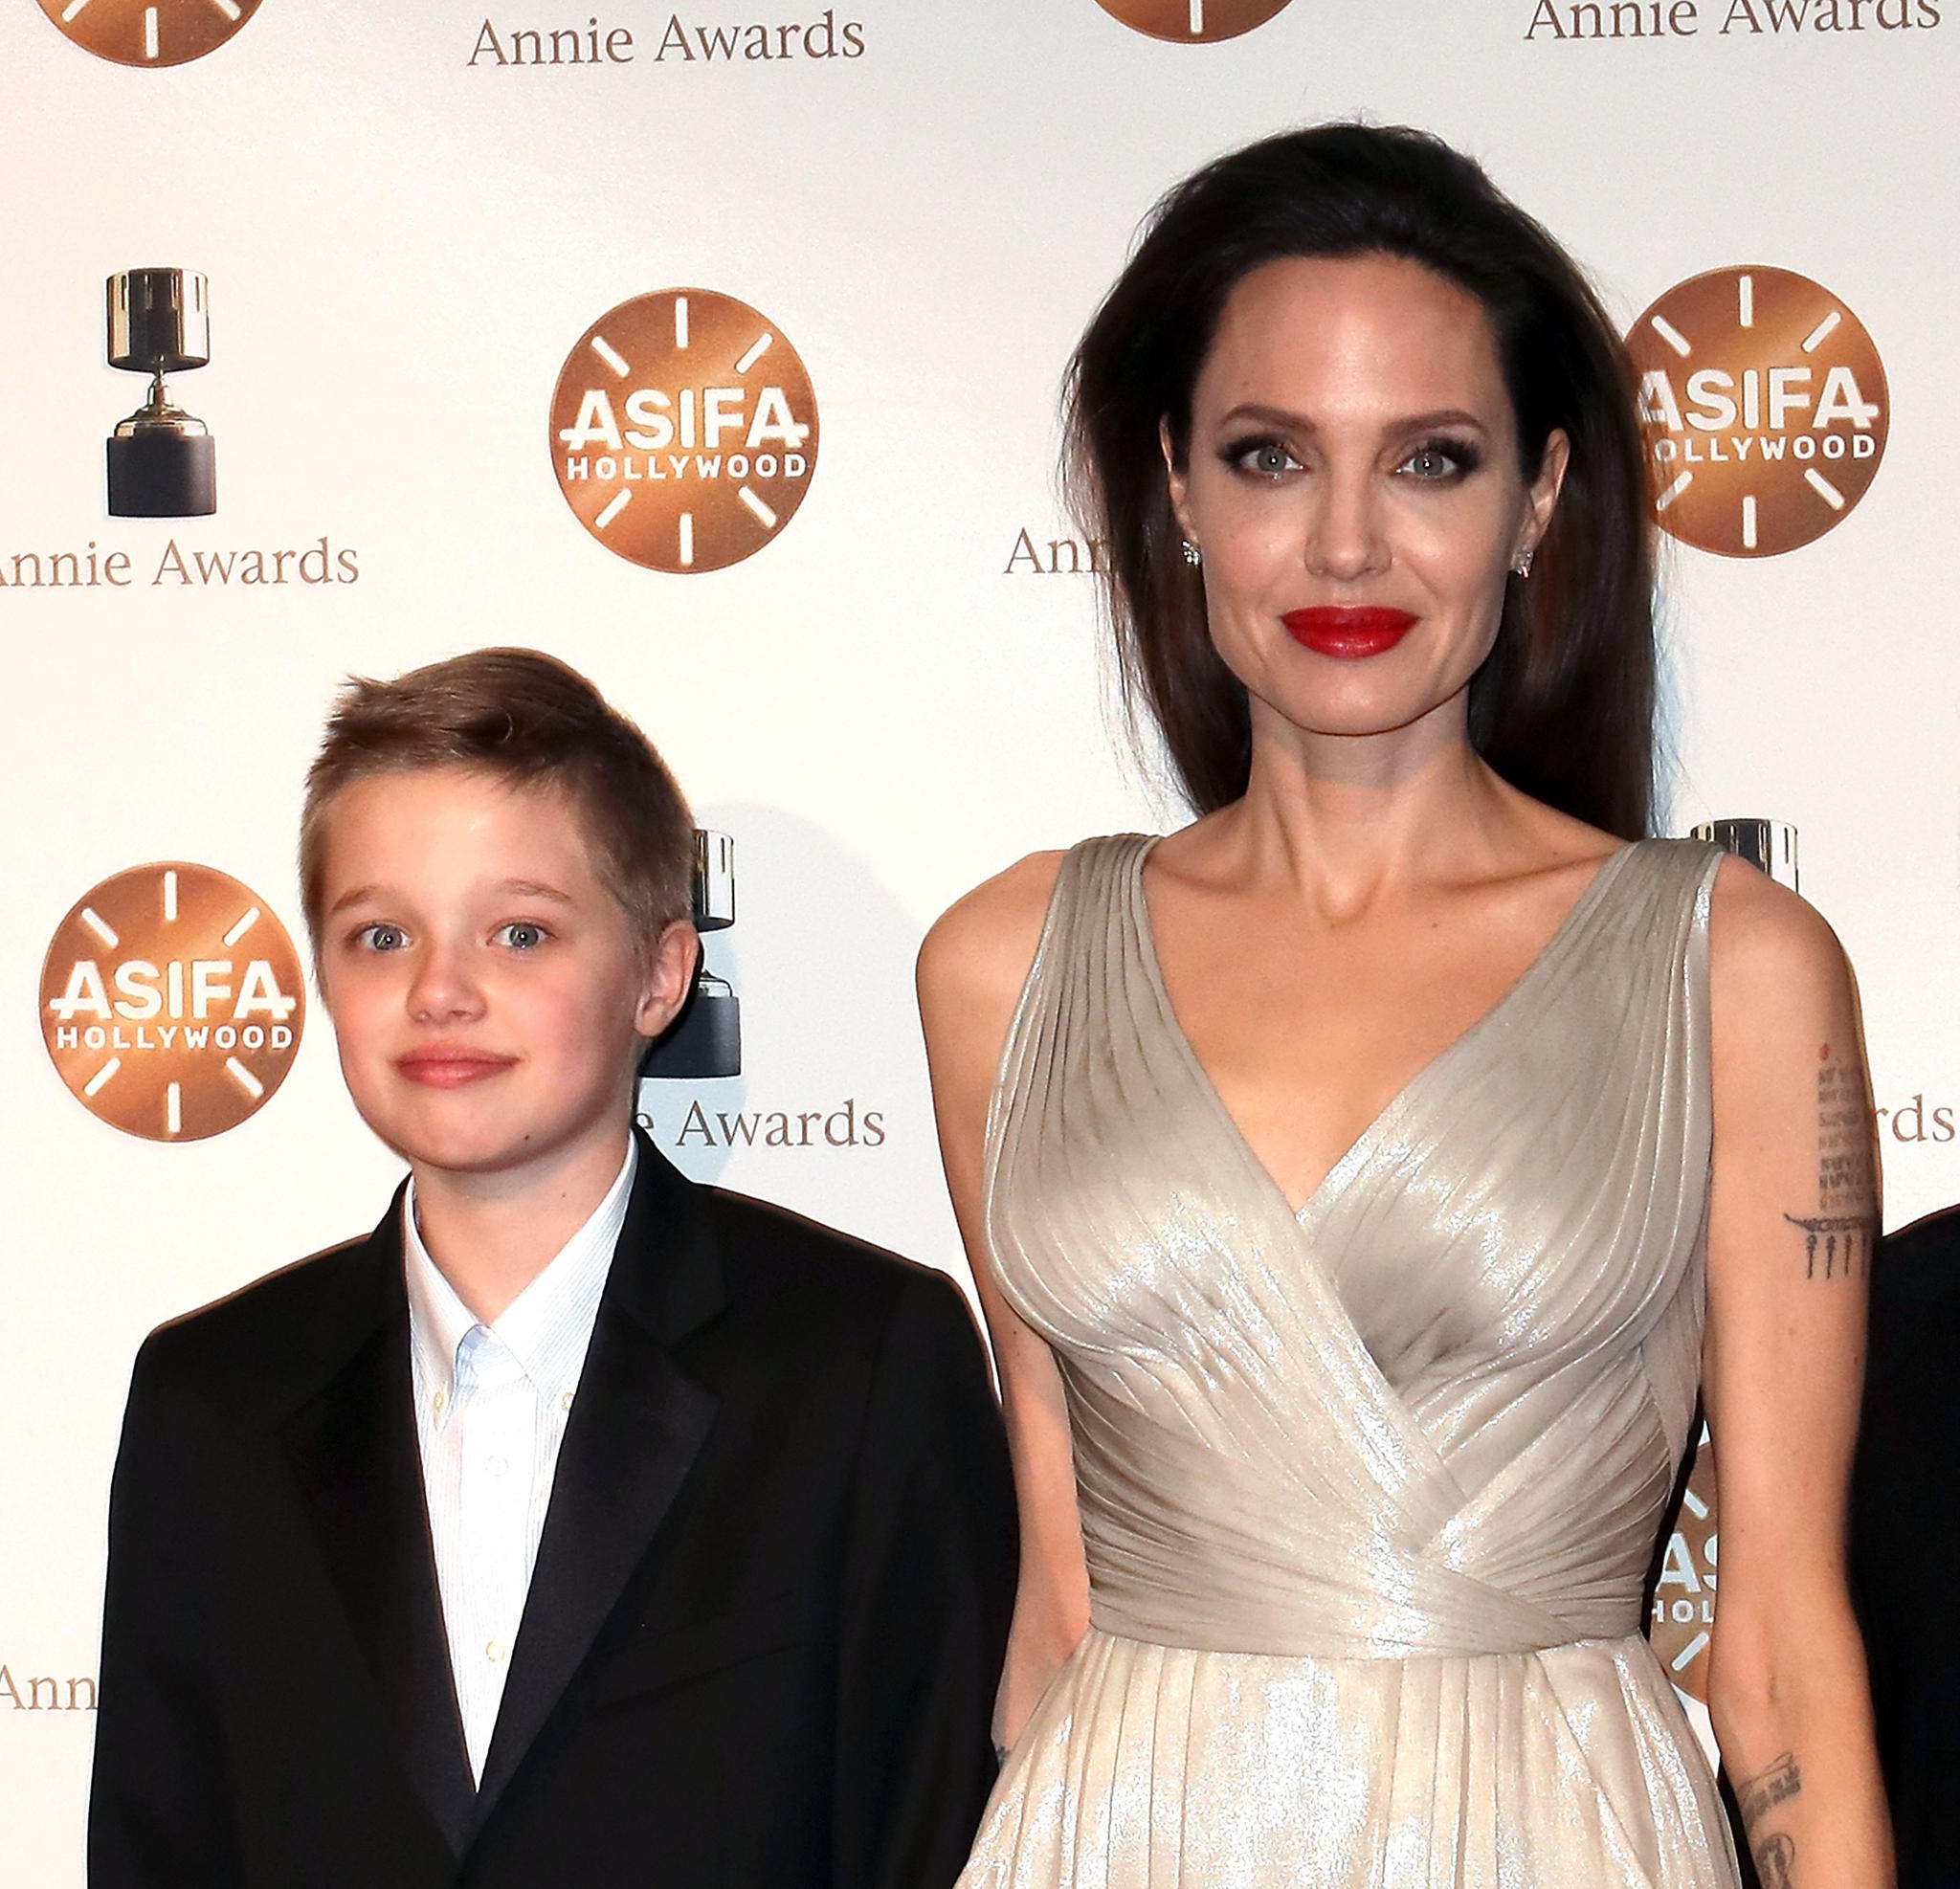 Shiloh Jolie Pitt und Angelina Jolie